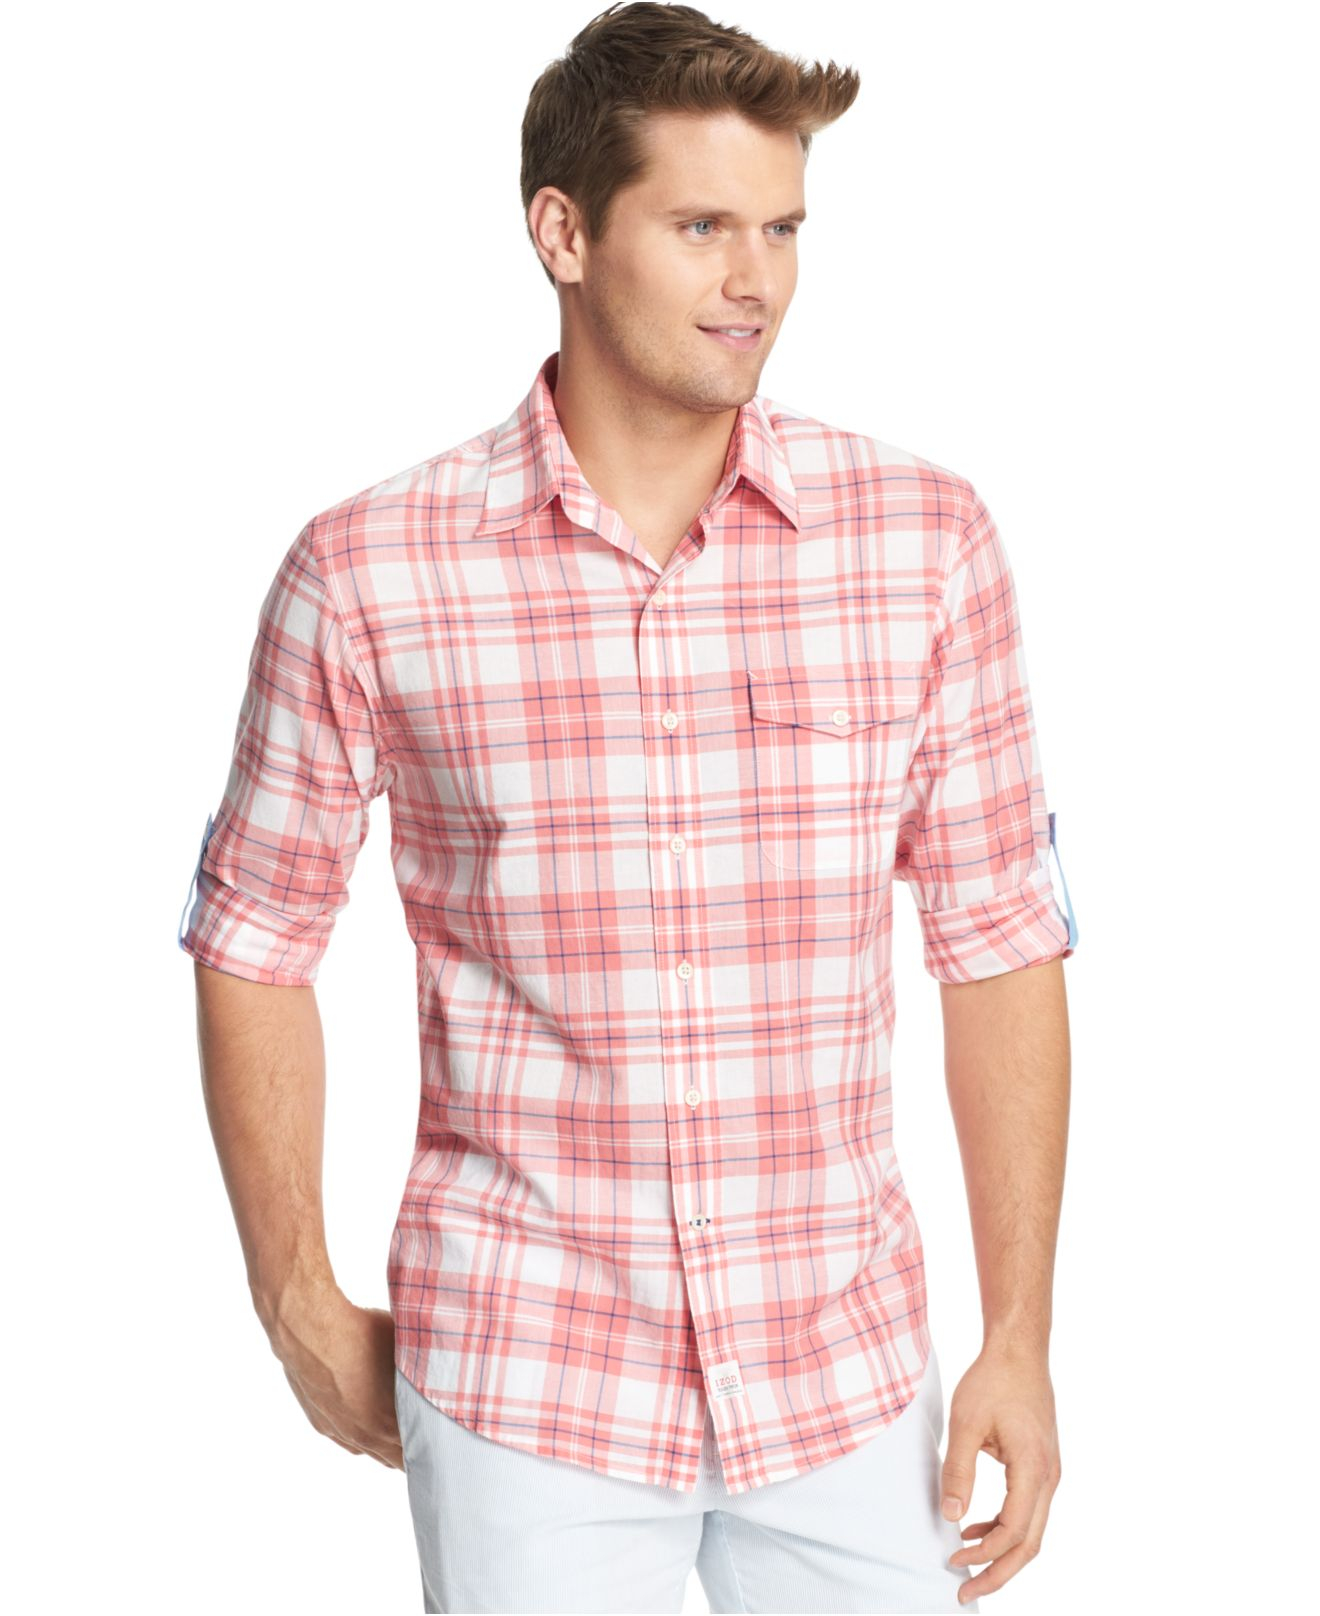 Lyst izod lightweight plaid pocket long sleeve shirt in for Lightweight plaid shirt womens